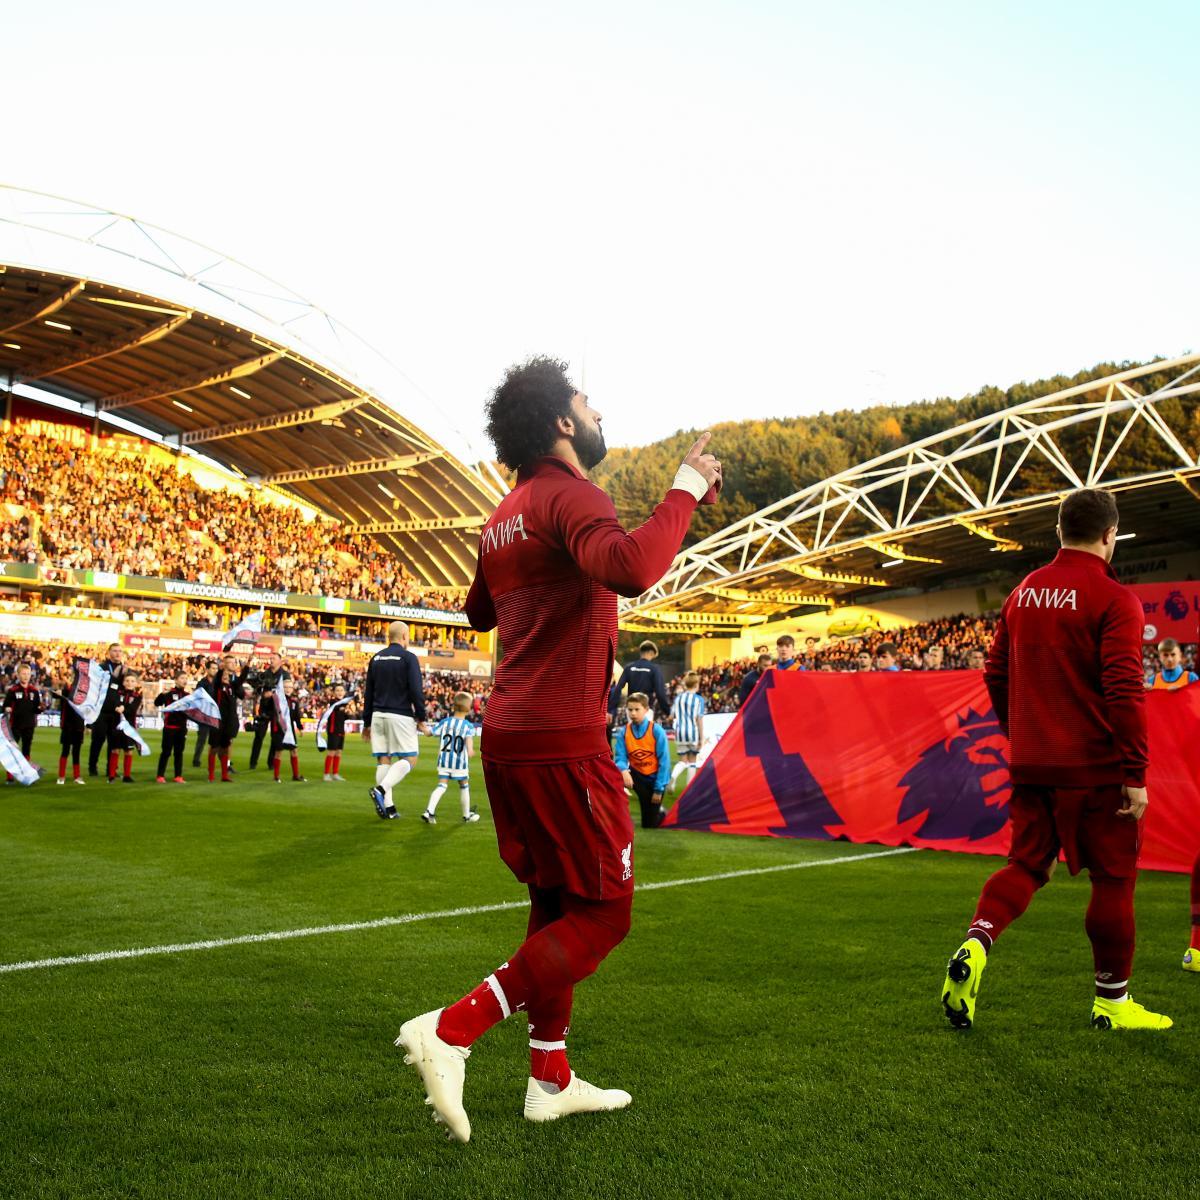 Live Streaming Soccer News Liverpool Vs Benfica Live: Liverpool Vs. Red Star Belgrade: Odds, Live Stream, TV